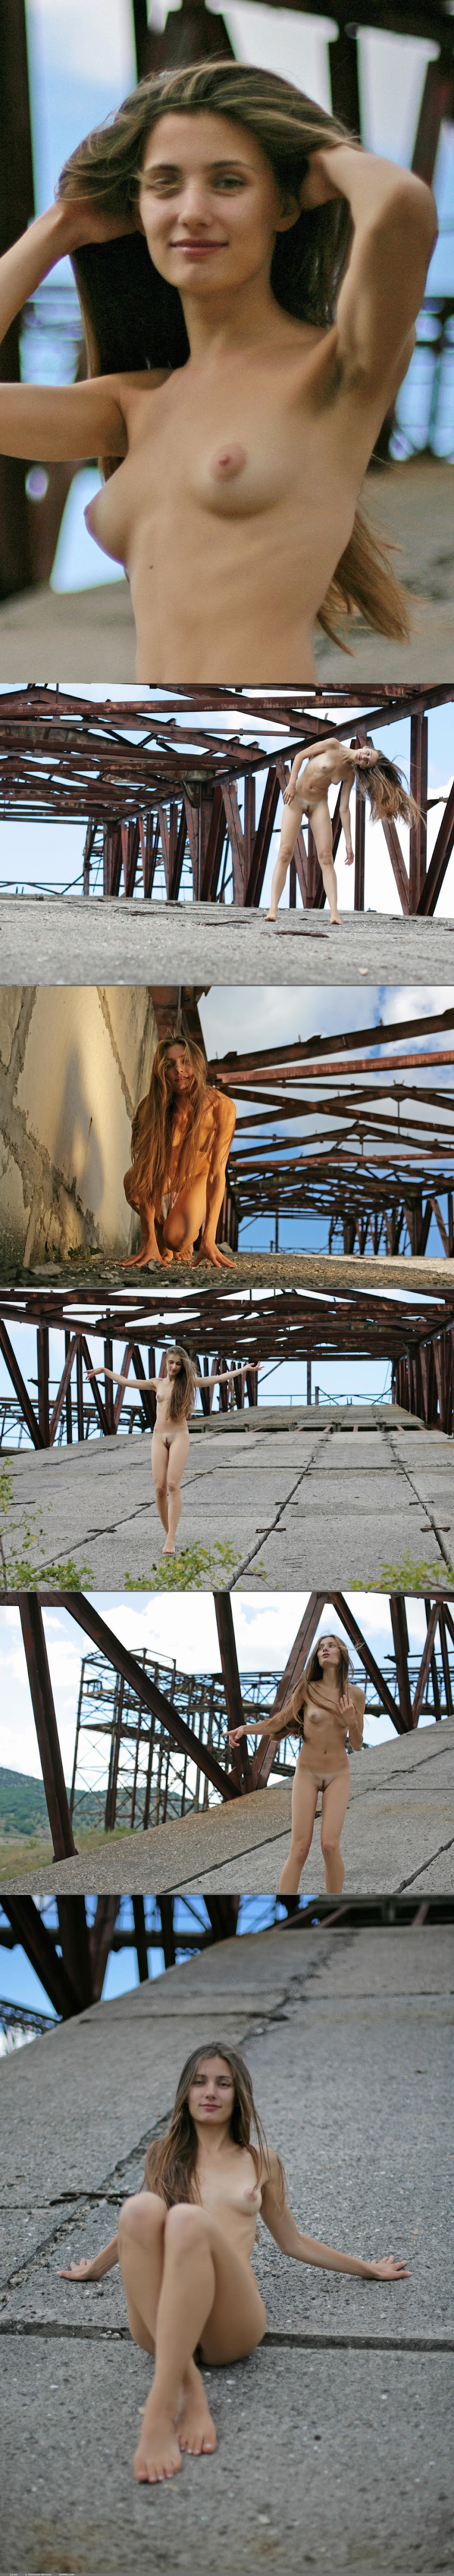 [Domai] Leraa - Photoset 01 / by Stanislav Borovec